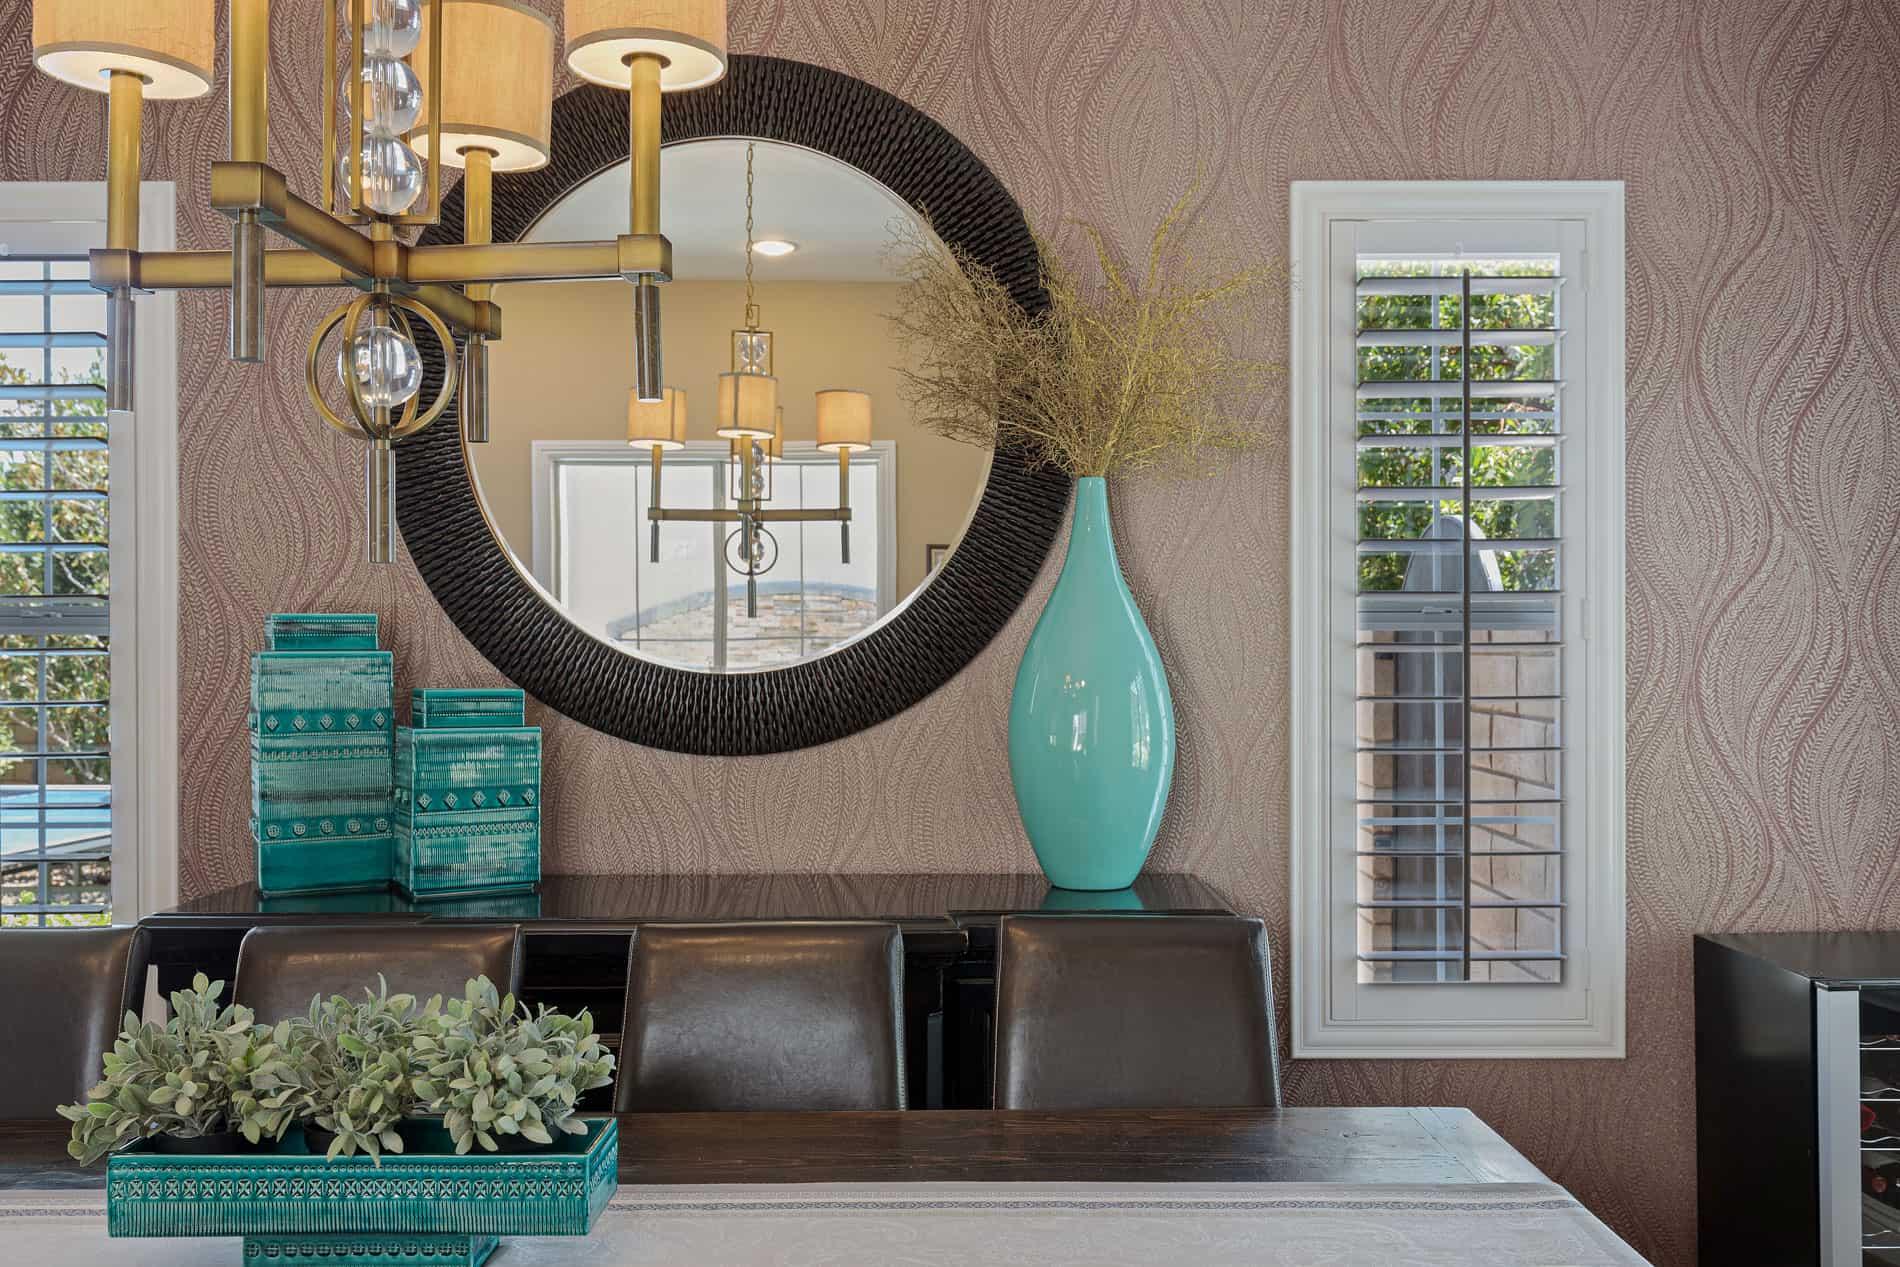 las-vegas-luxry-real-estate-realtor-rob-jensen-company-12108-vista-linda-avenue-the-paseos009